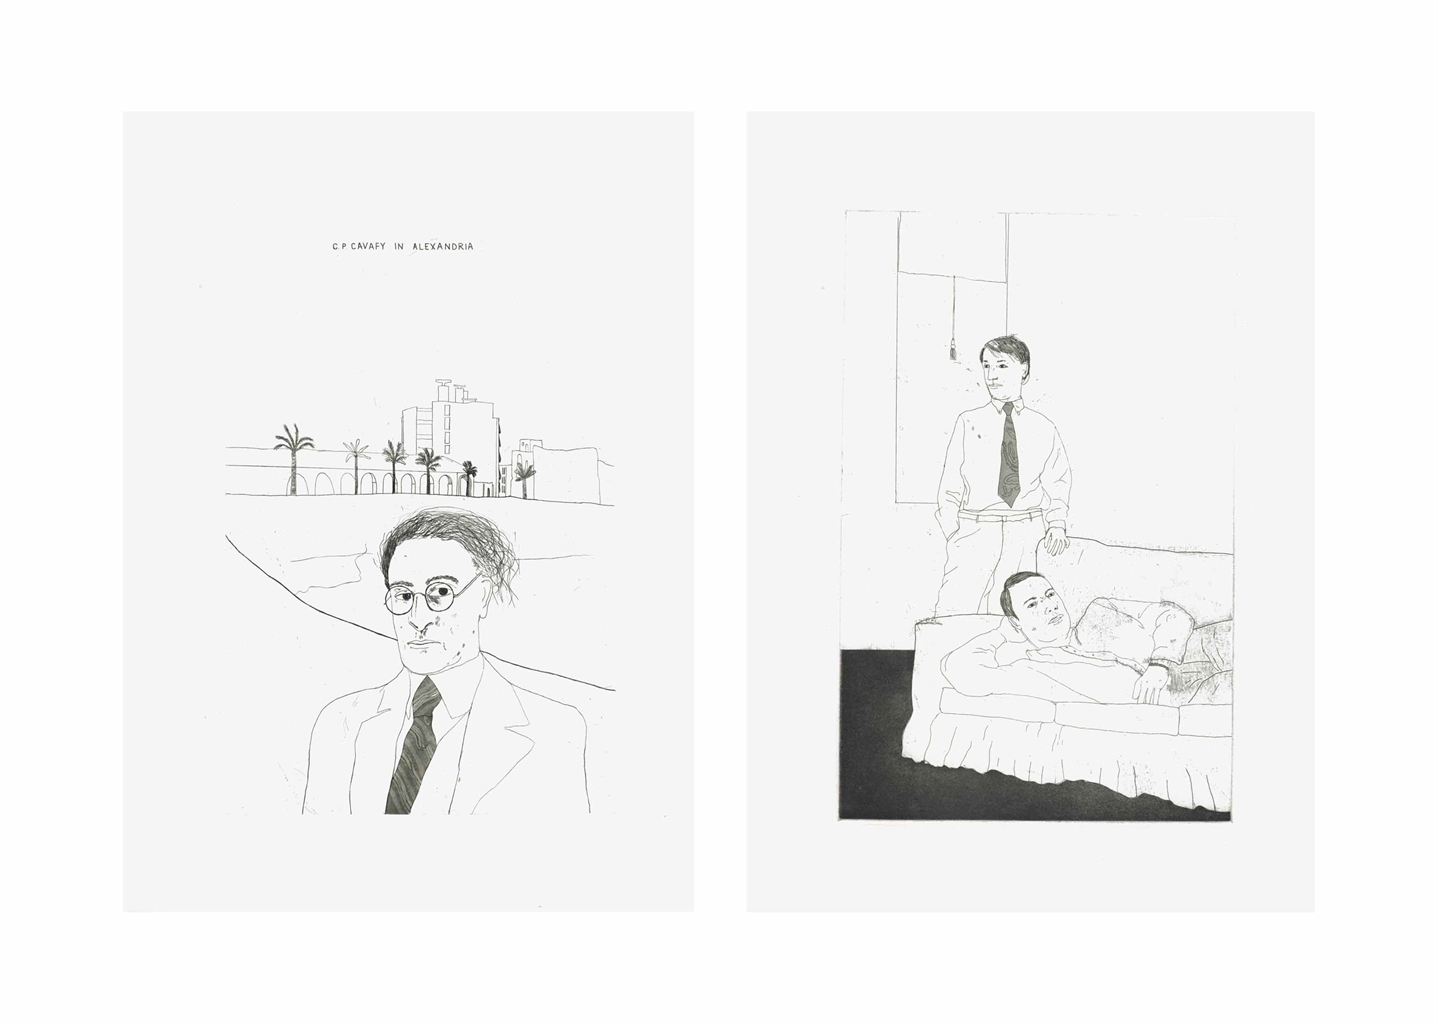 David Hockney-Fourteen Poems by C. P. Cavafy-1981